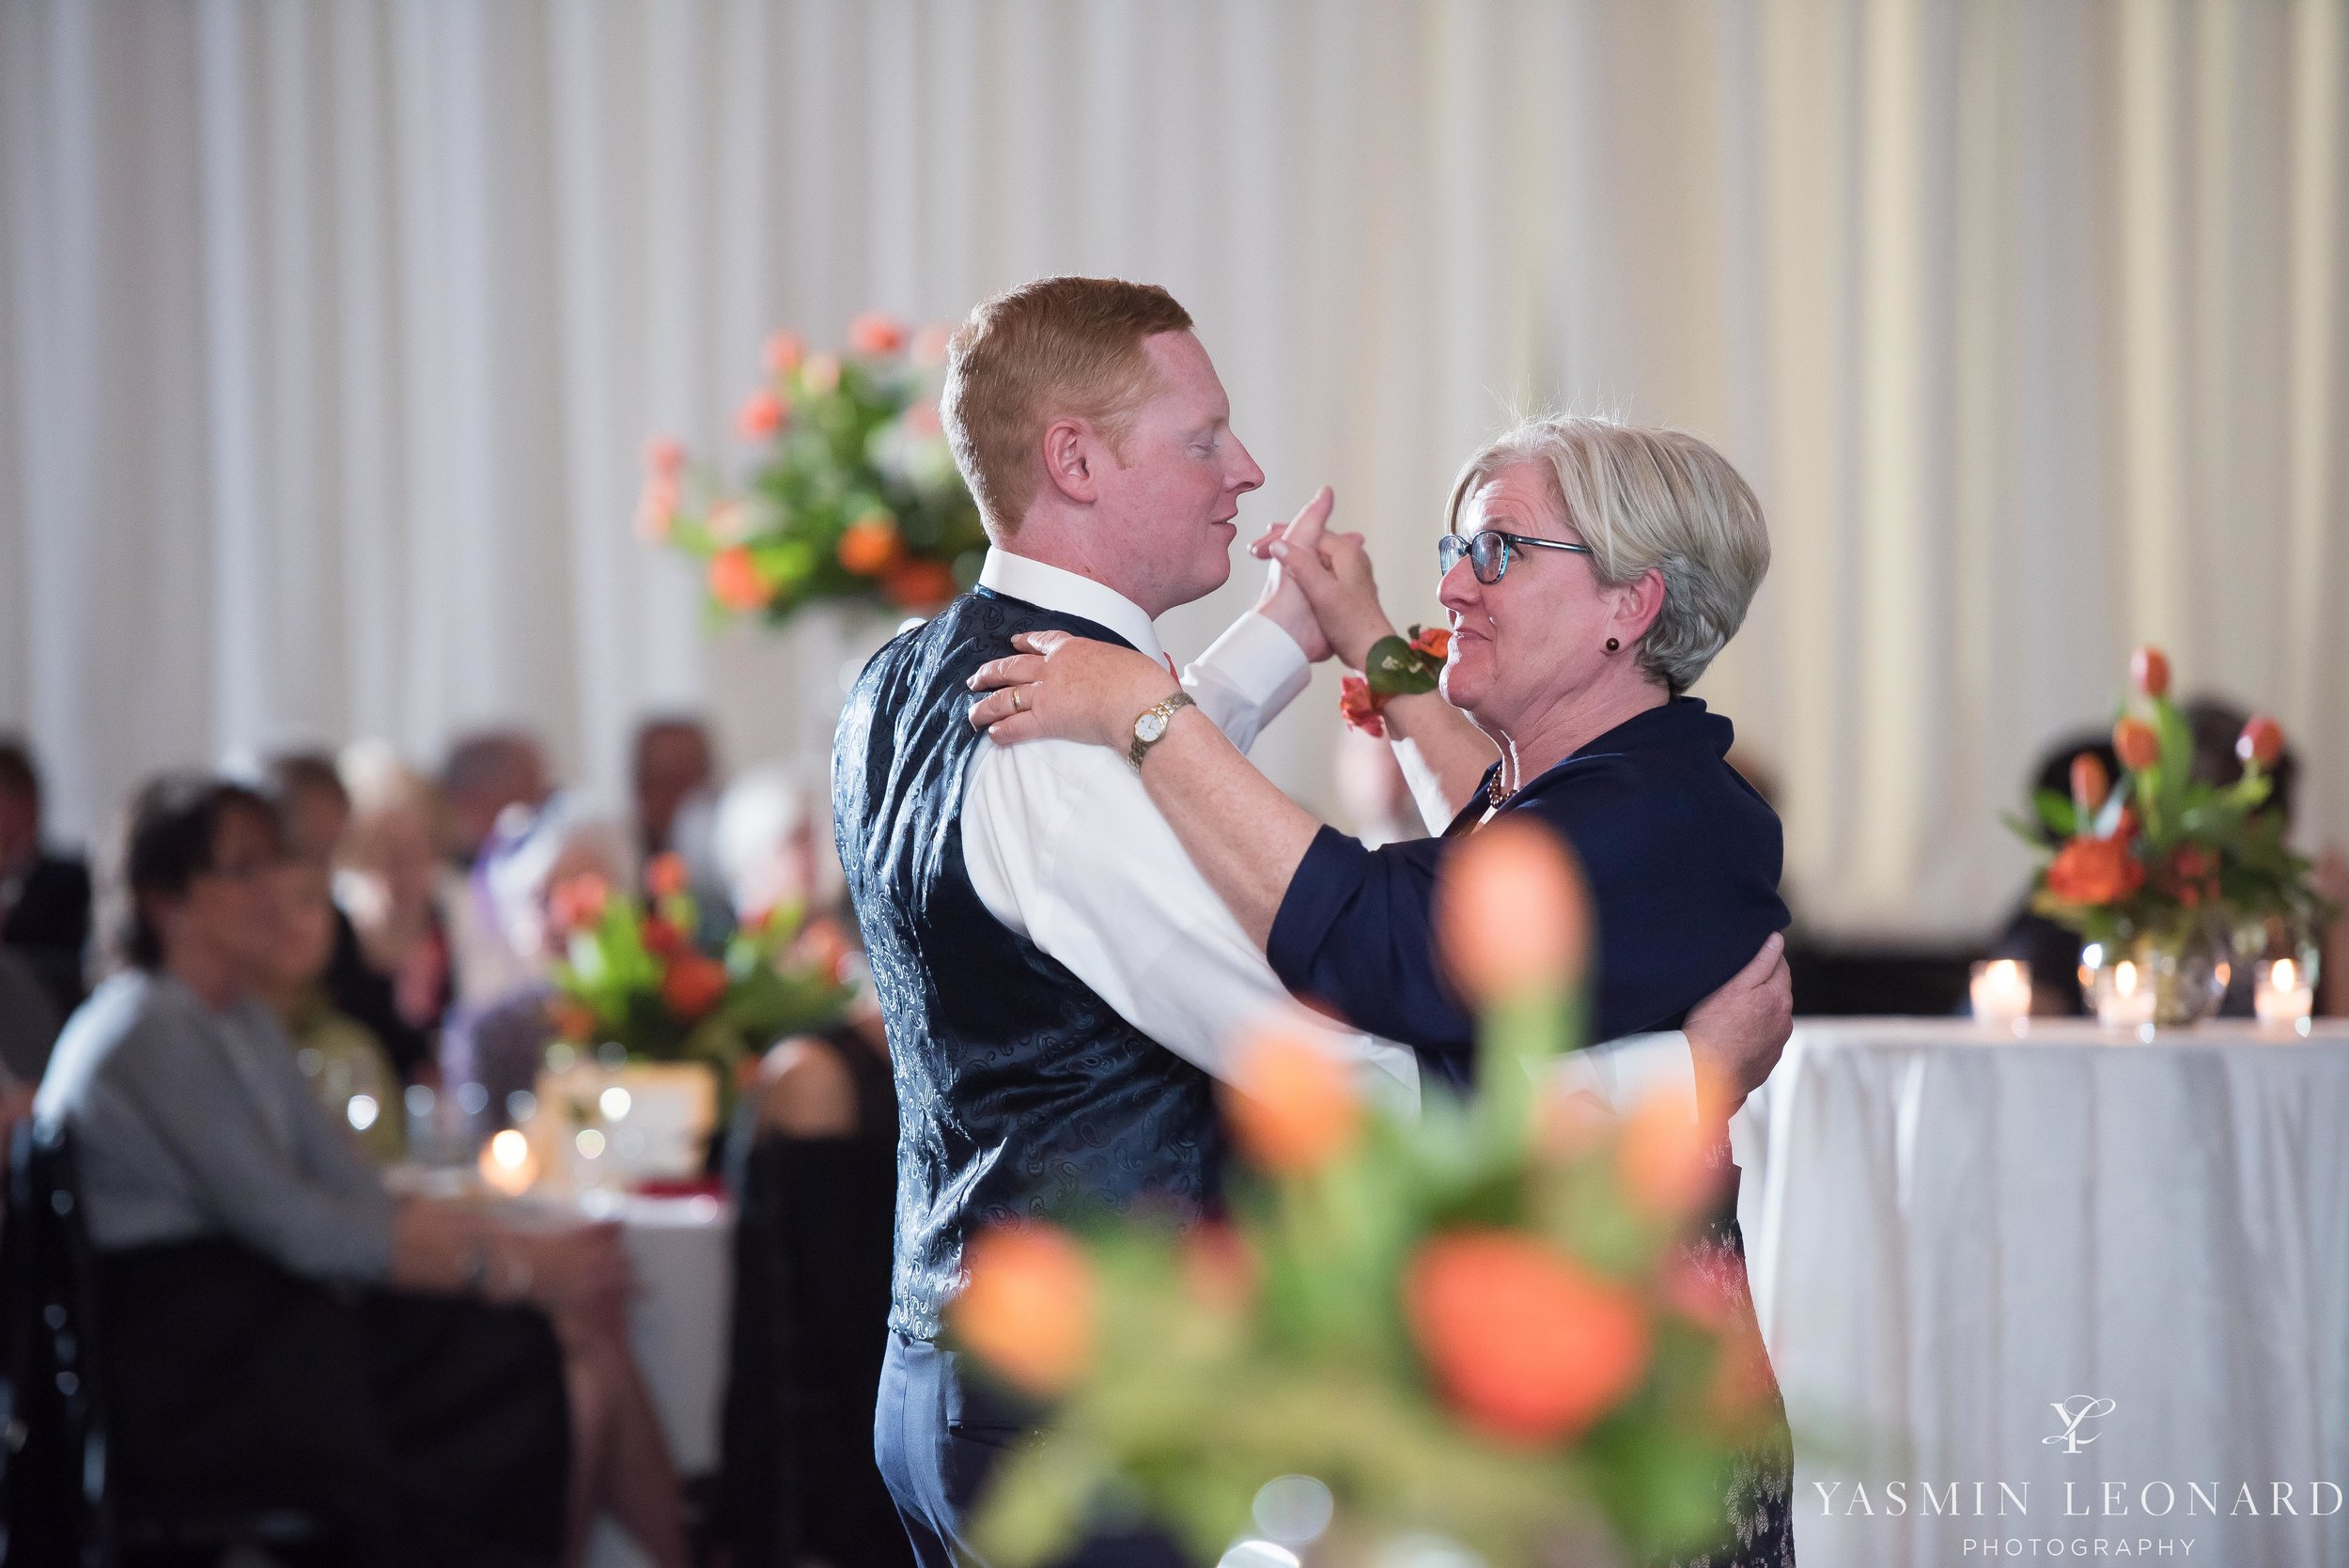 Adaumont Farm - Adaumont Farm Weddings - Trinity Weddings - NC Weddings - Yasmin Leonard Photography-72.jpg